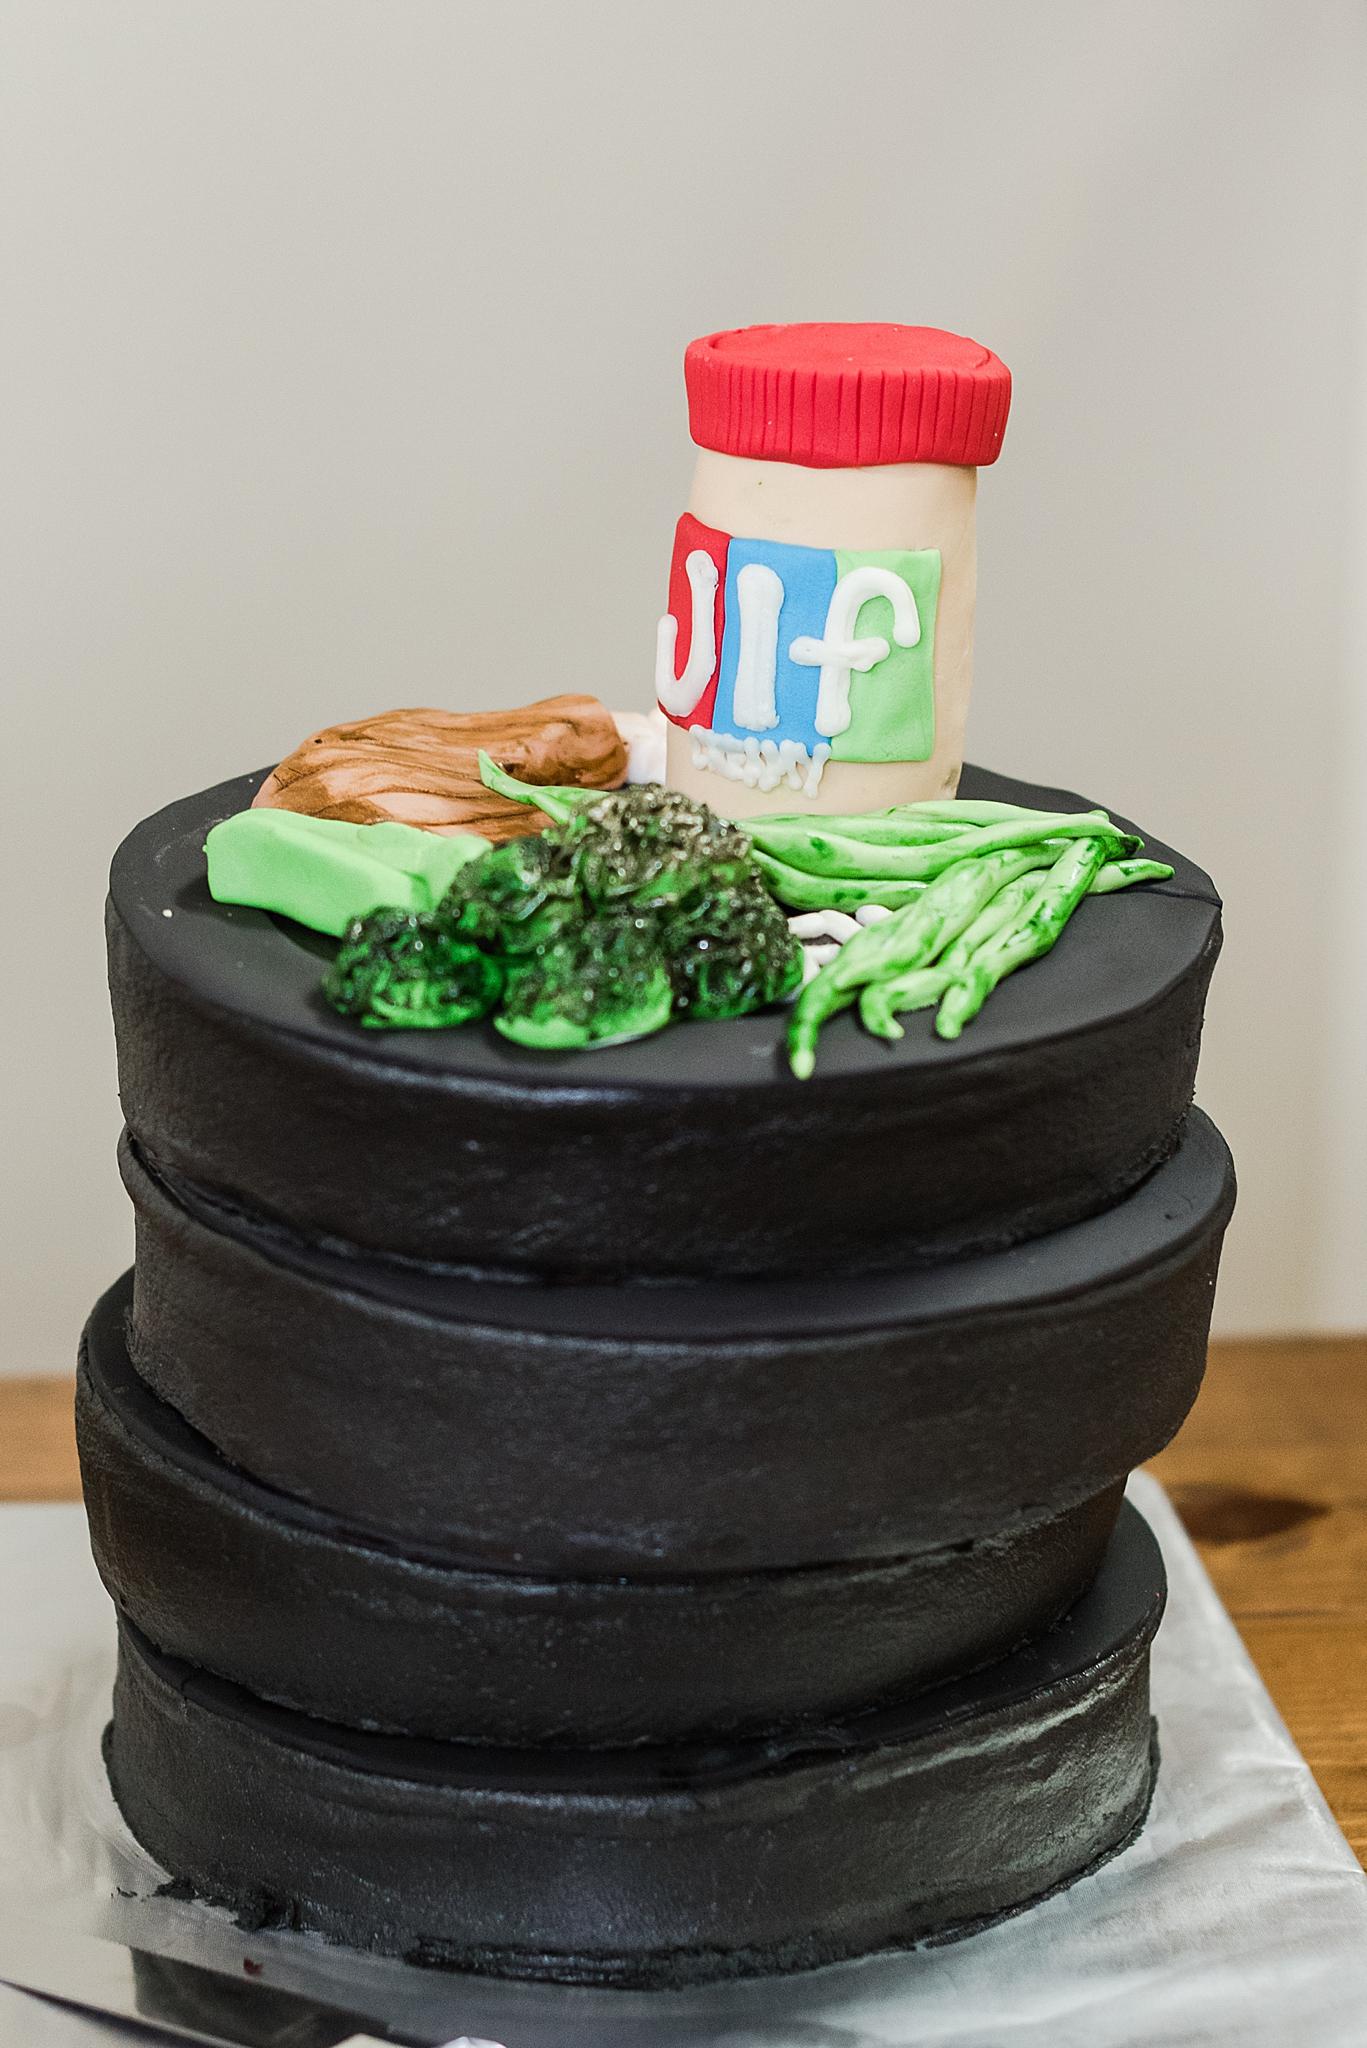 groom's custom wedding cake for Izenstone wedding day